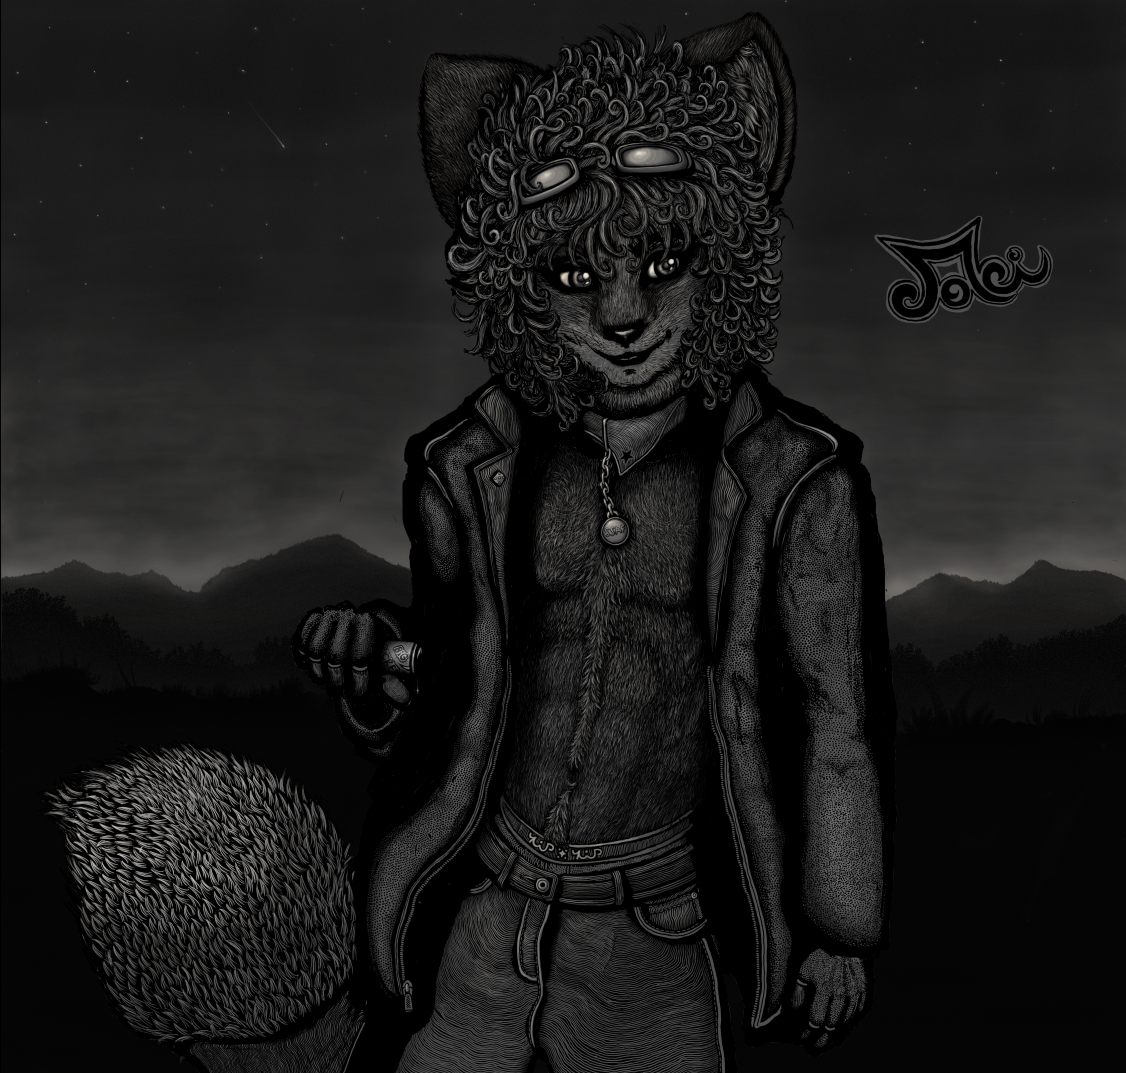 appalling furry crap pt 2